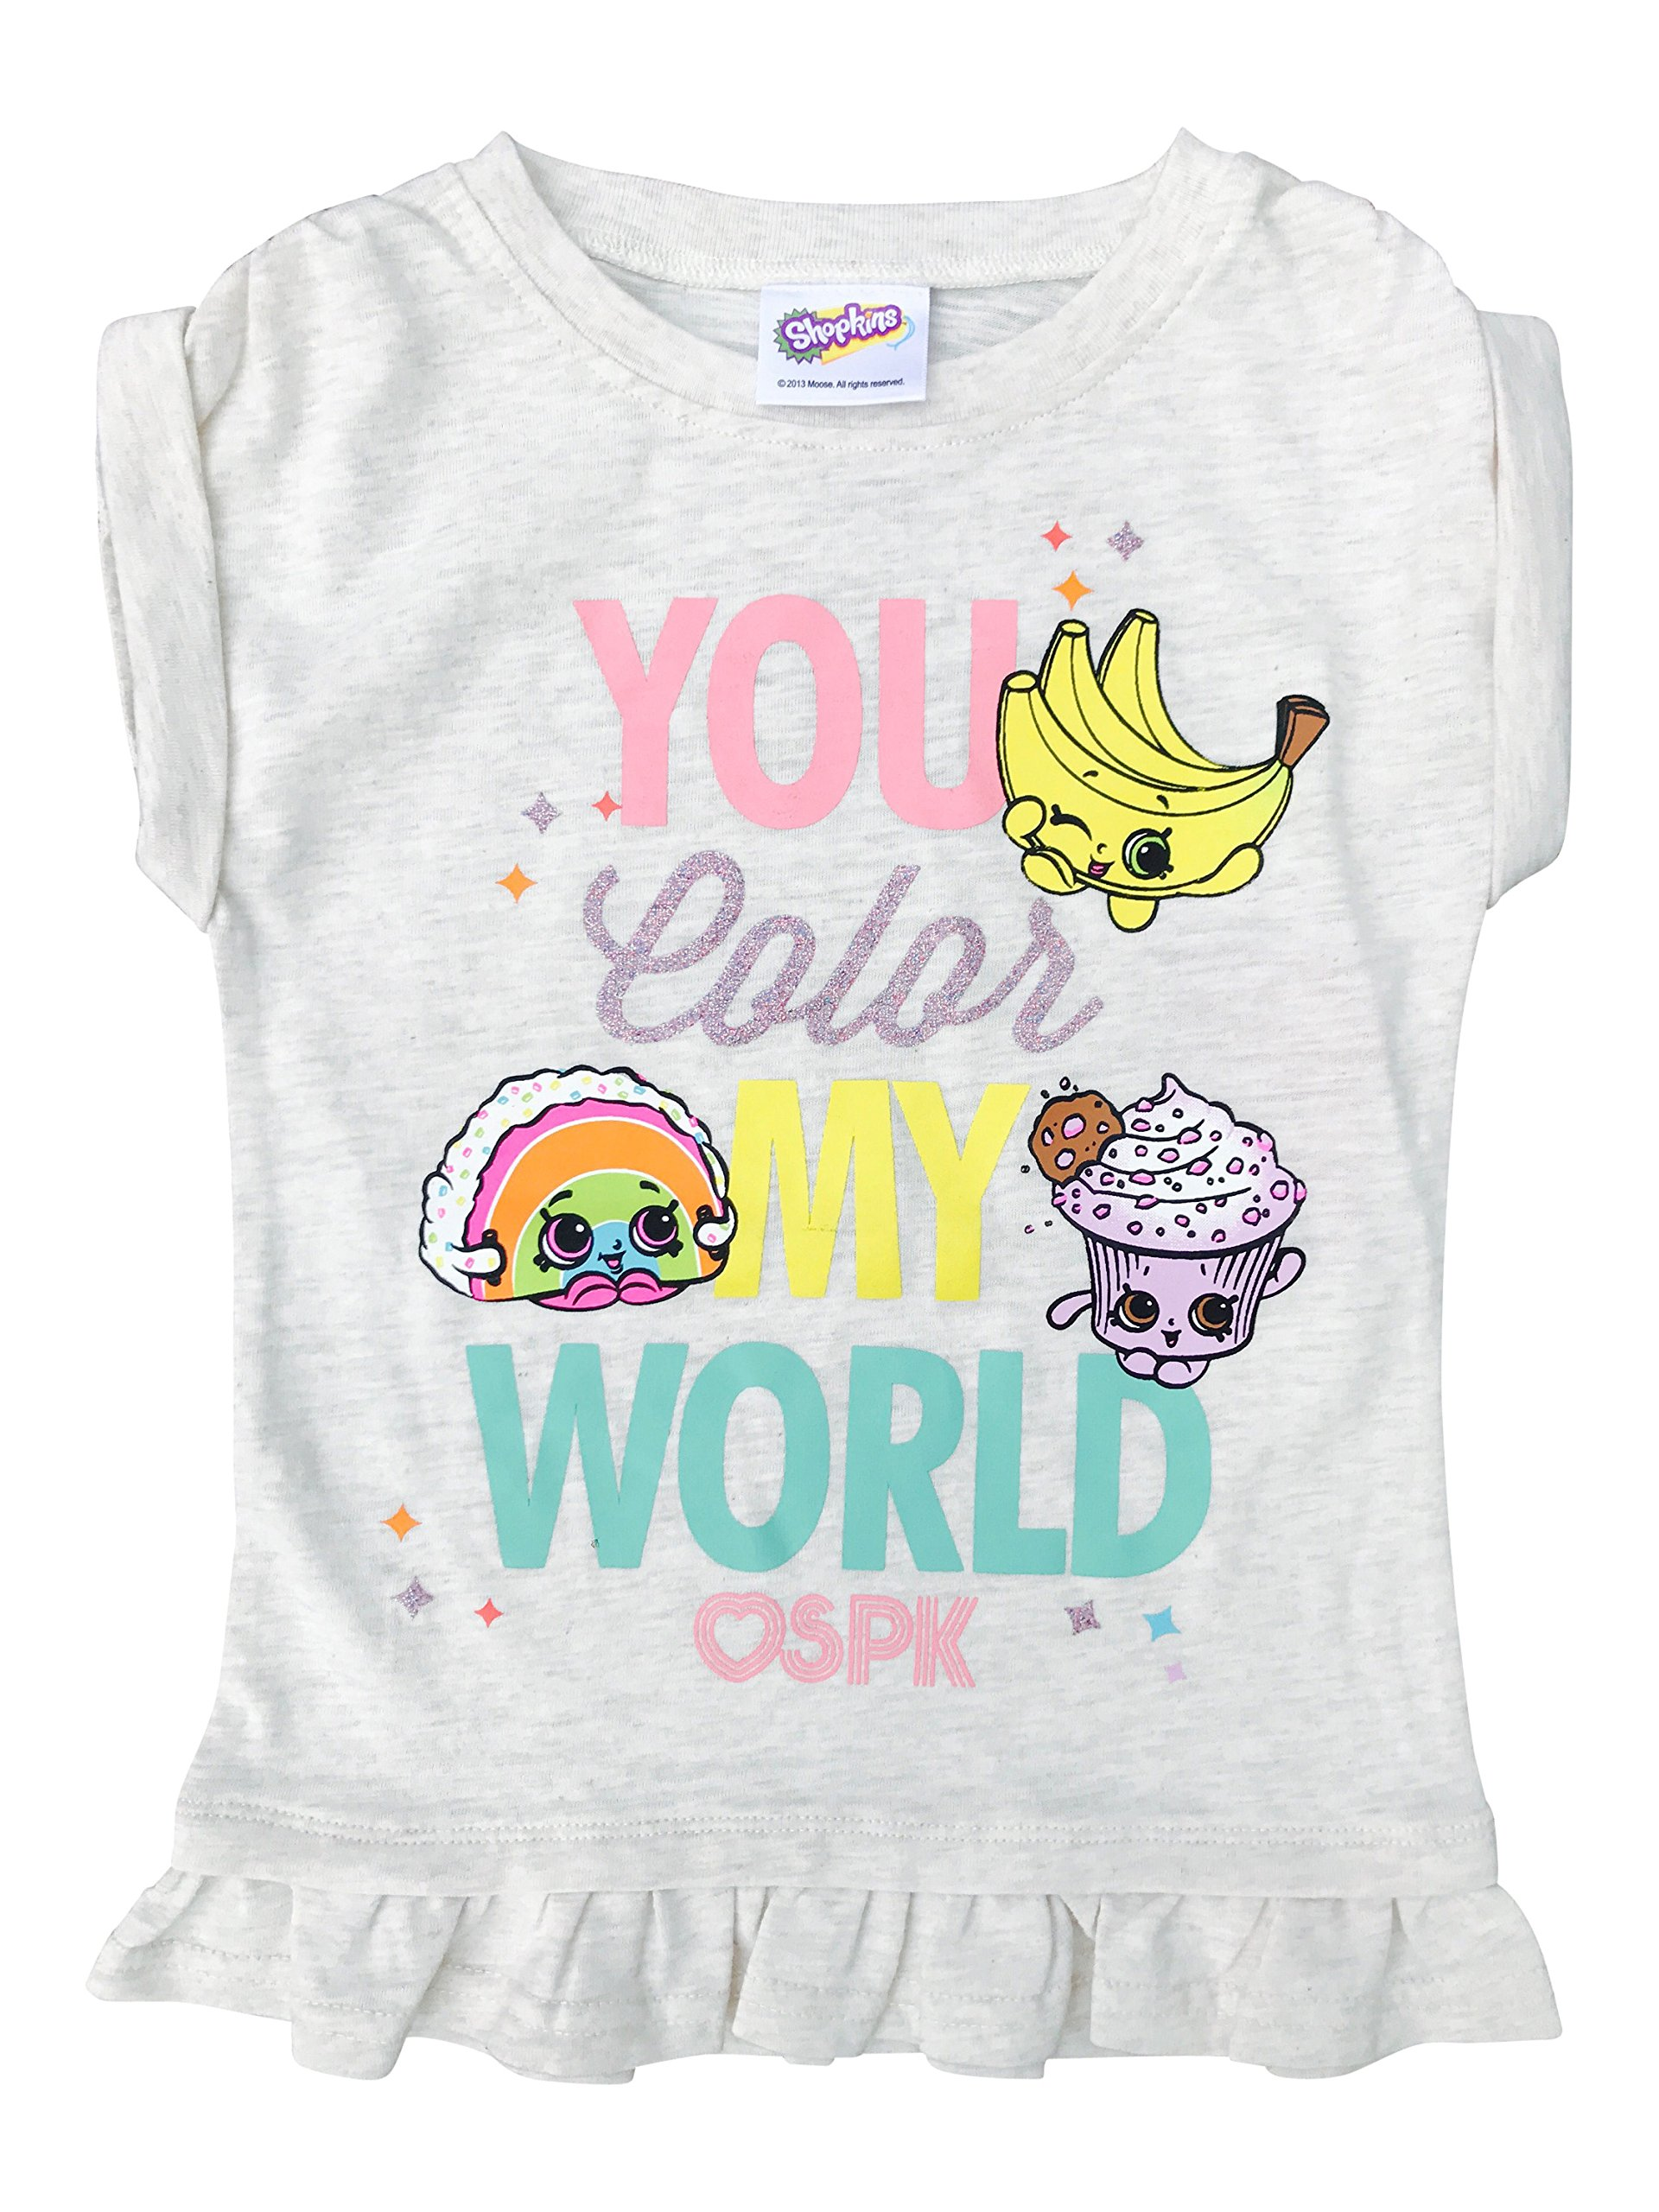 Shopkins Girls' Tee Shirt You Color My World W/Ruffle Hem Oatmeal Size 4